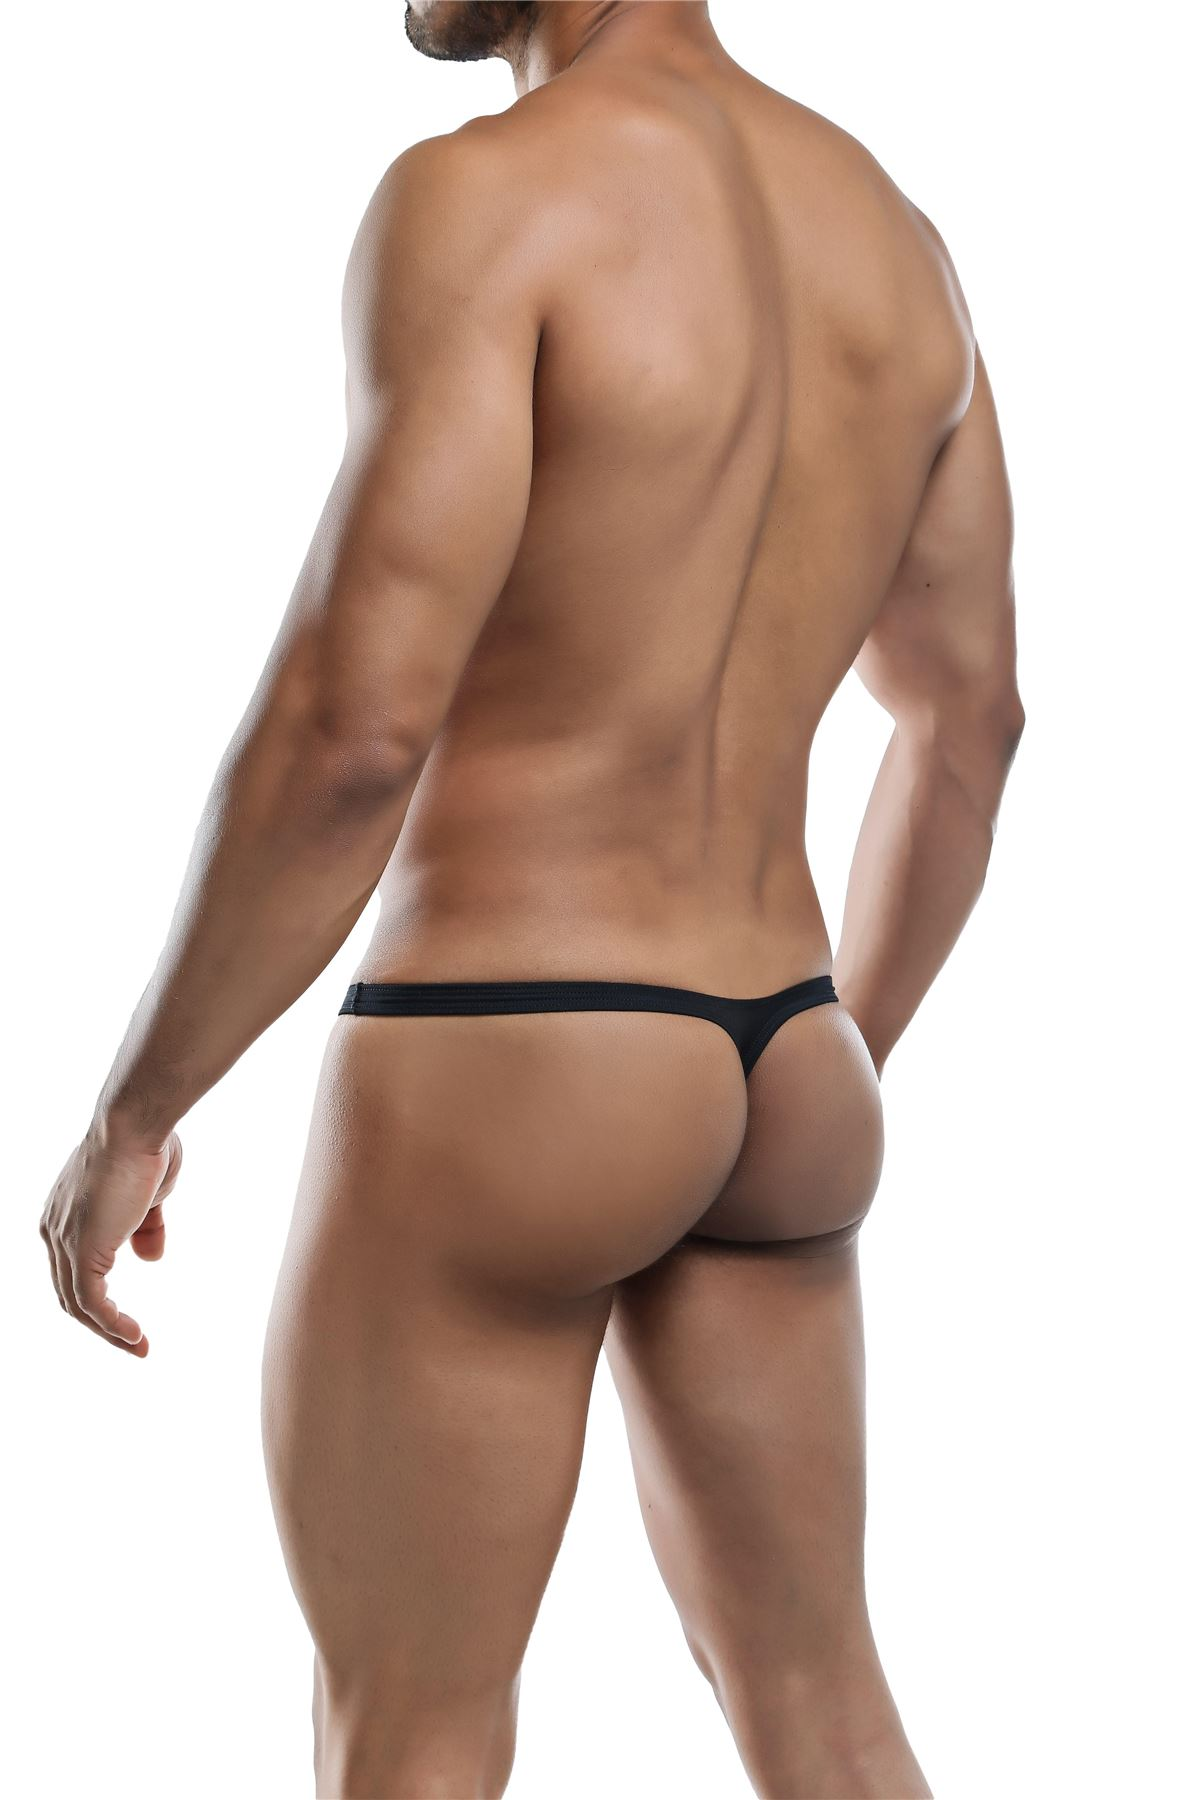 Joe Snyder poliestere Collection Tanga curvatura 02 Da Uomo Biancheria intima Costumi da bagno Stringa